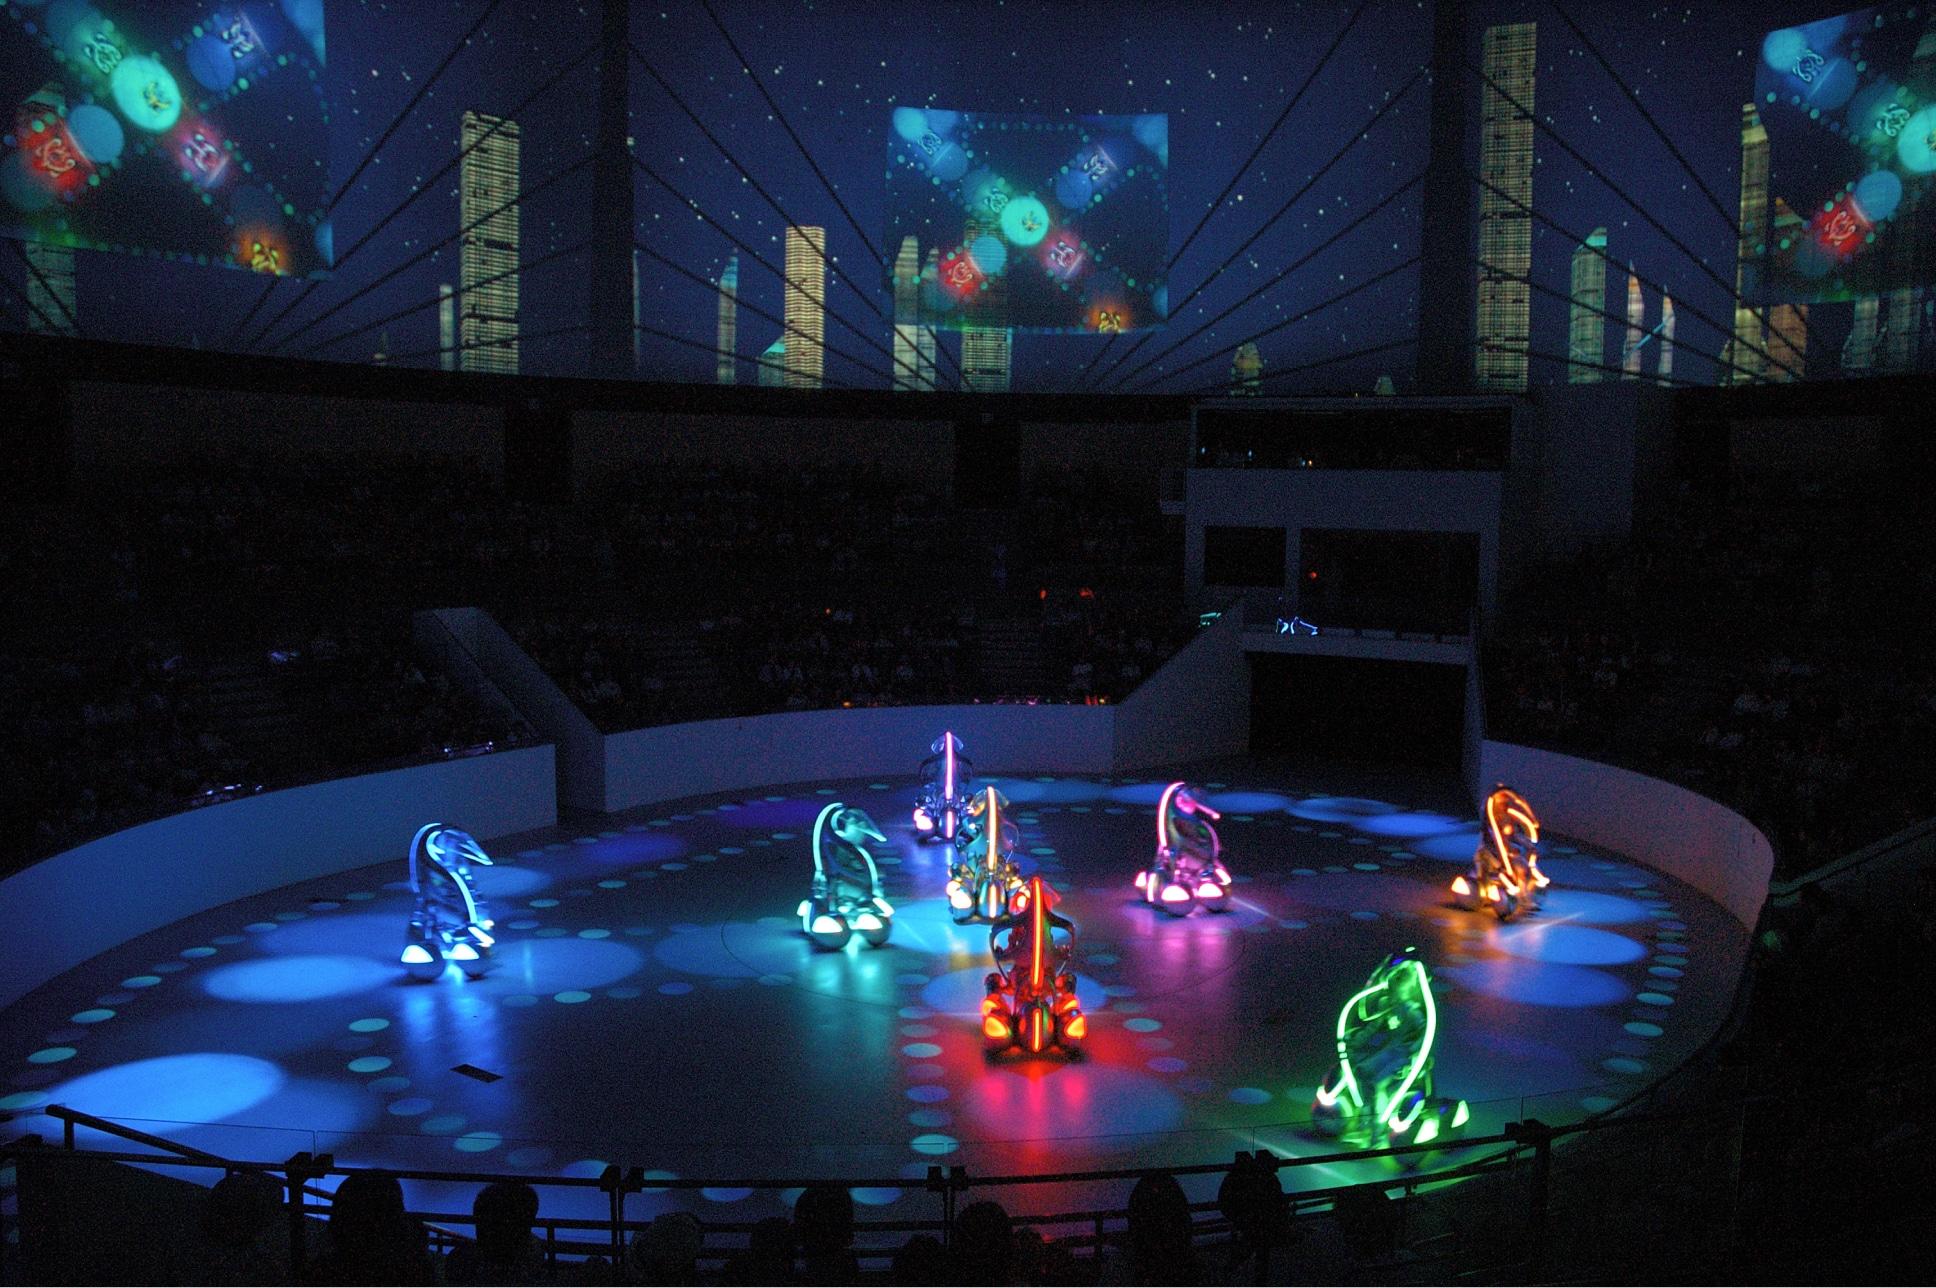 Movement-Is-Life-Aichi-International-Expo-0